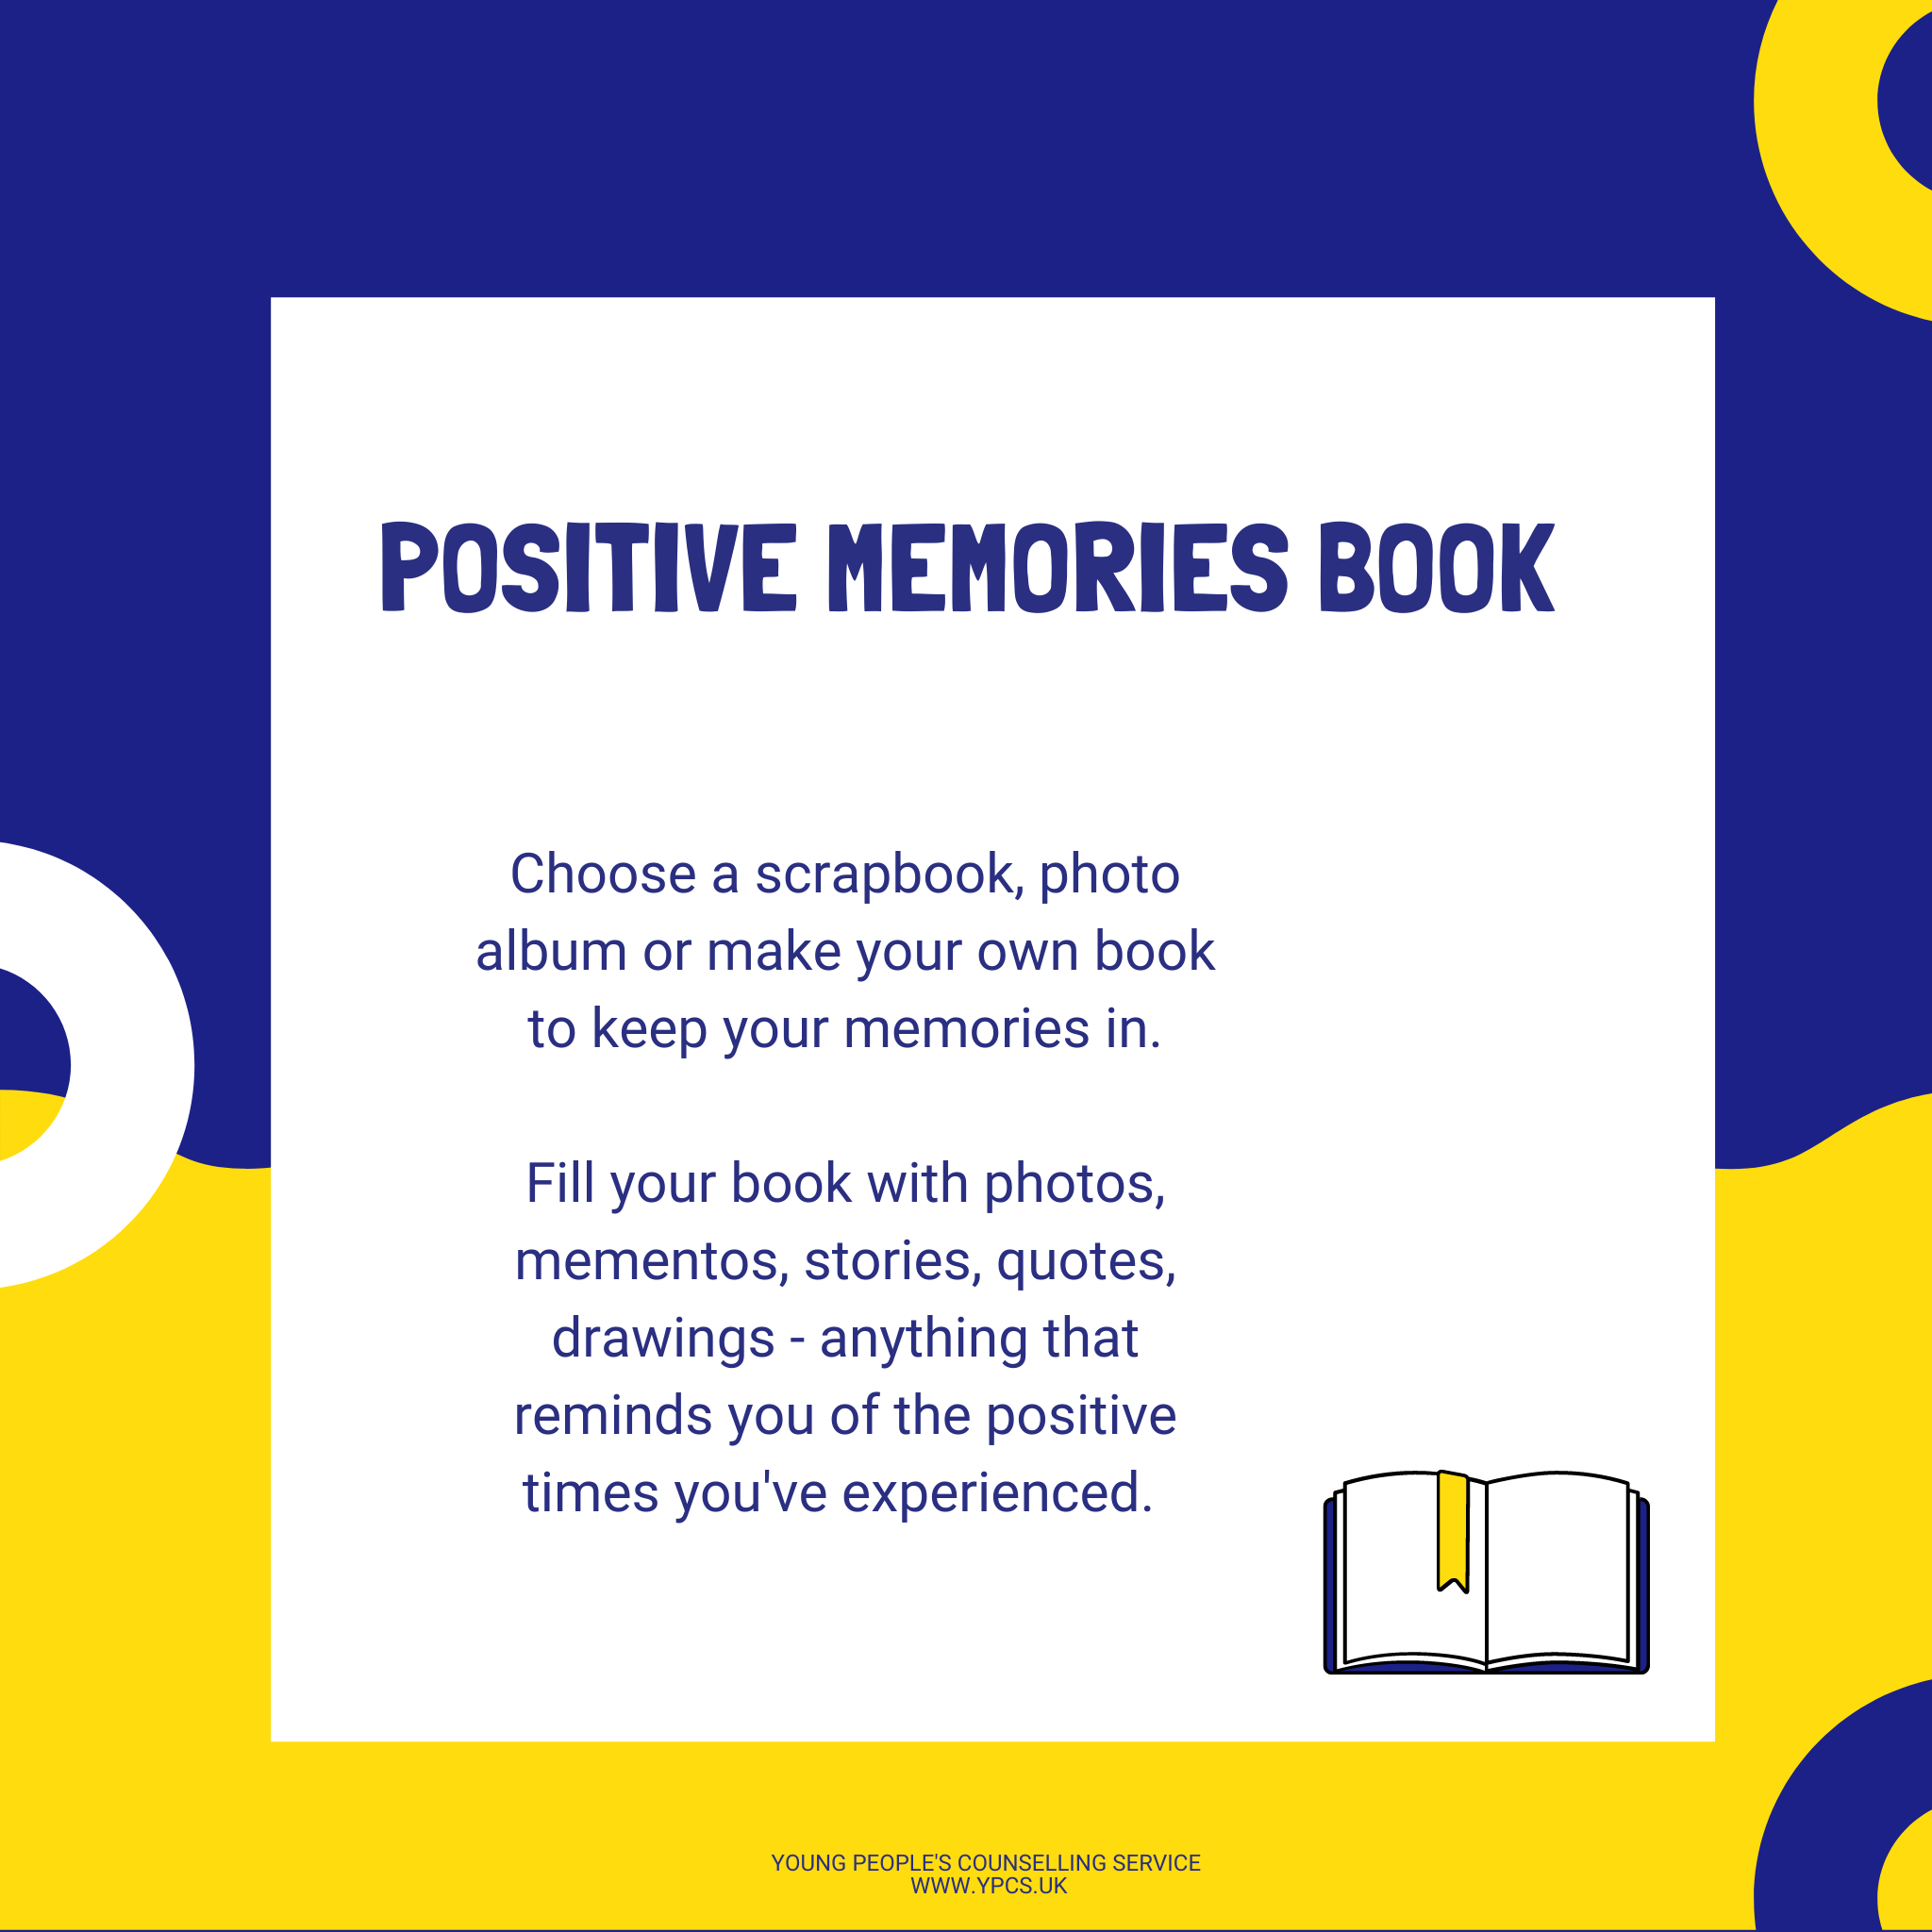 Positive Memories Book